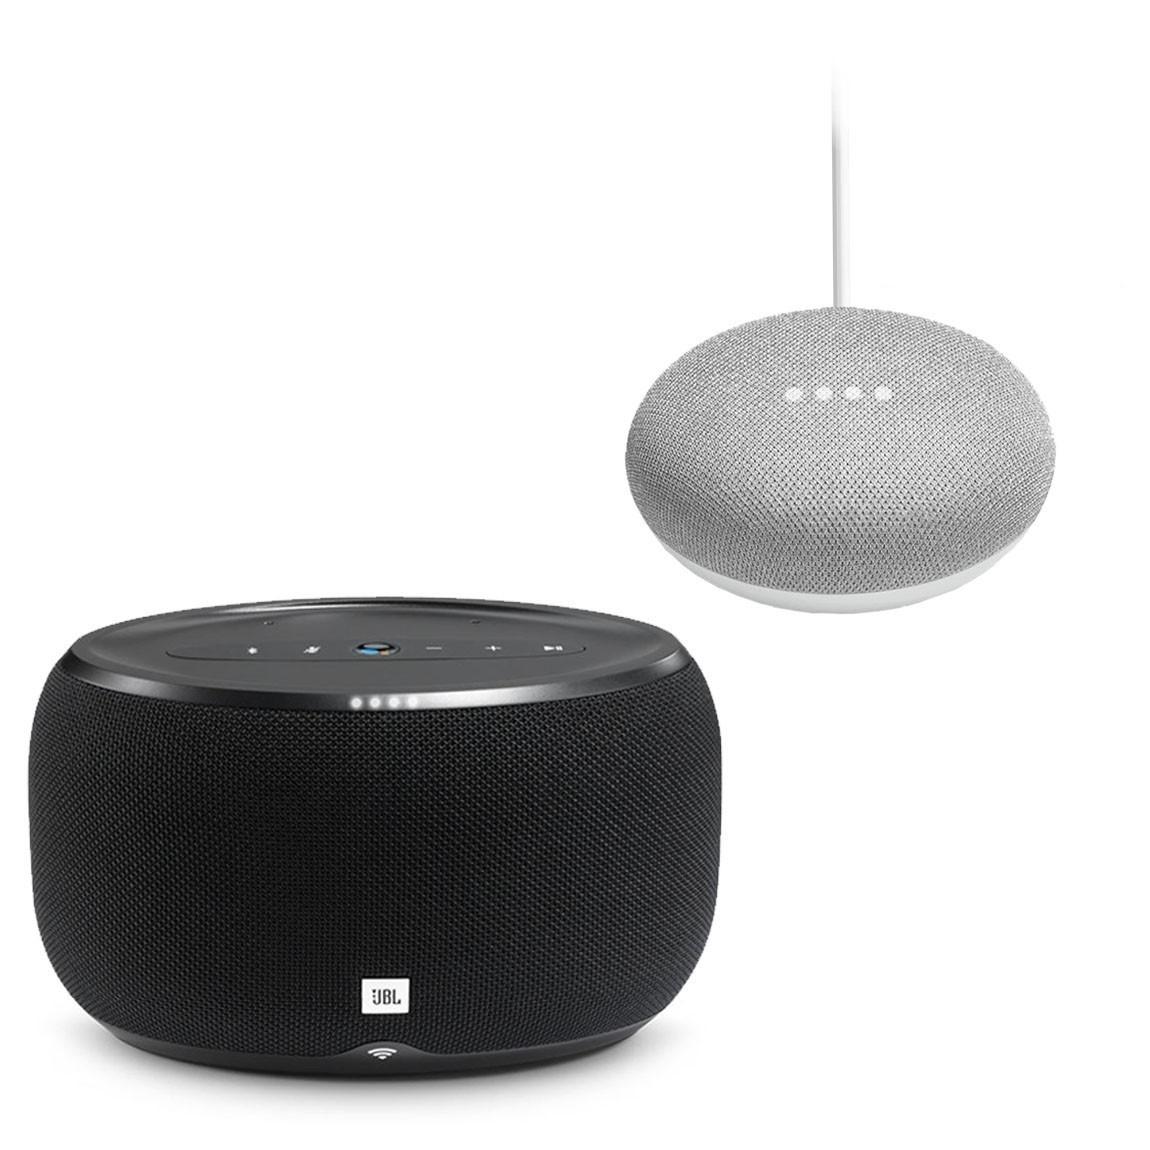 Google Nest, JBL JBL Link 300 + gratis Google Home Mini